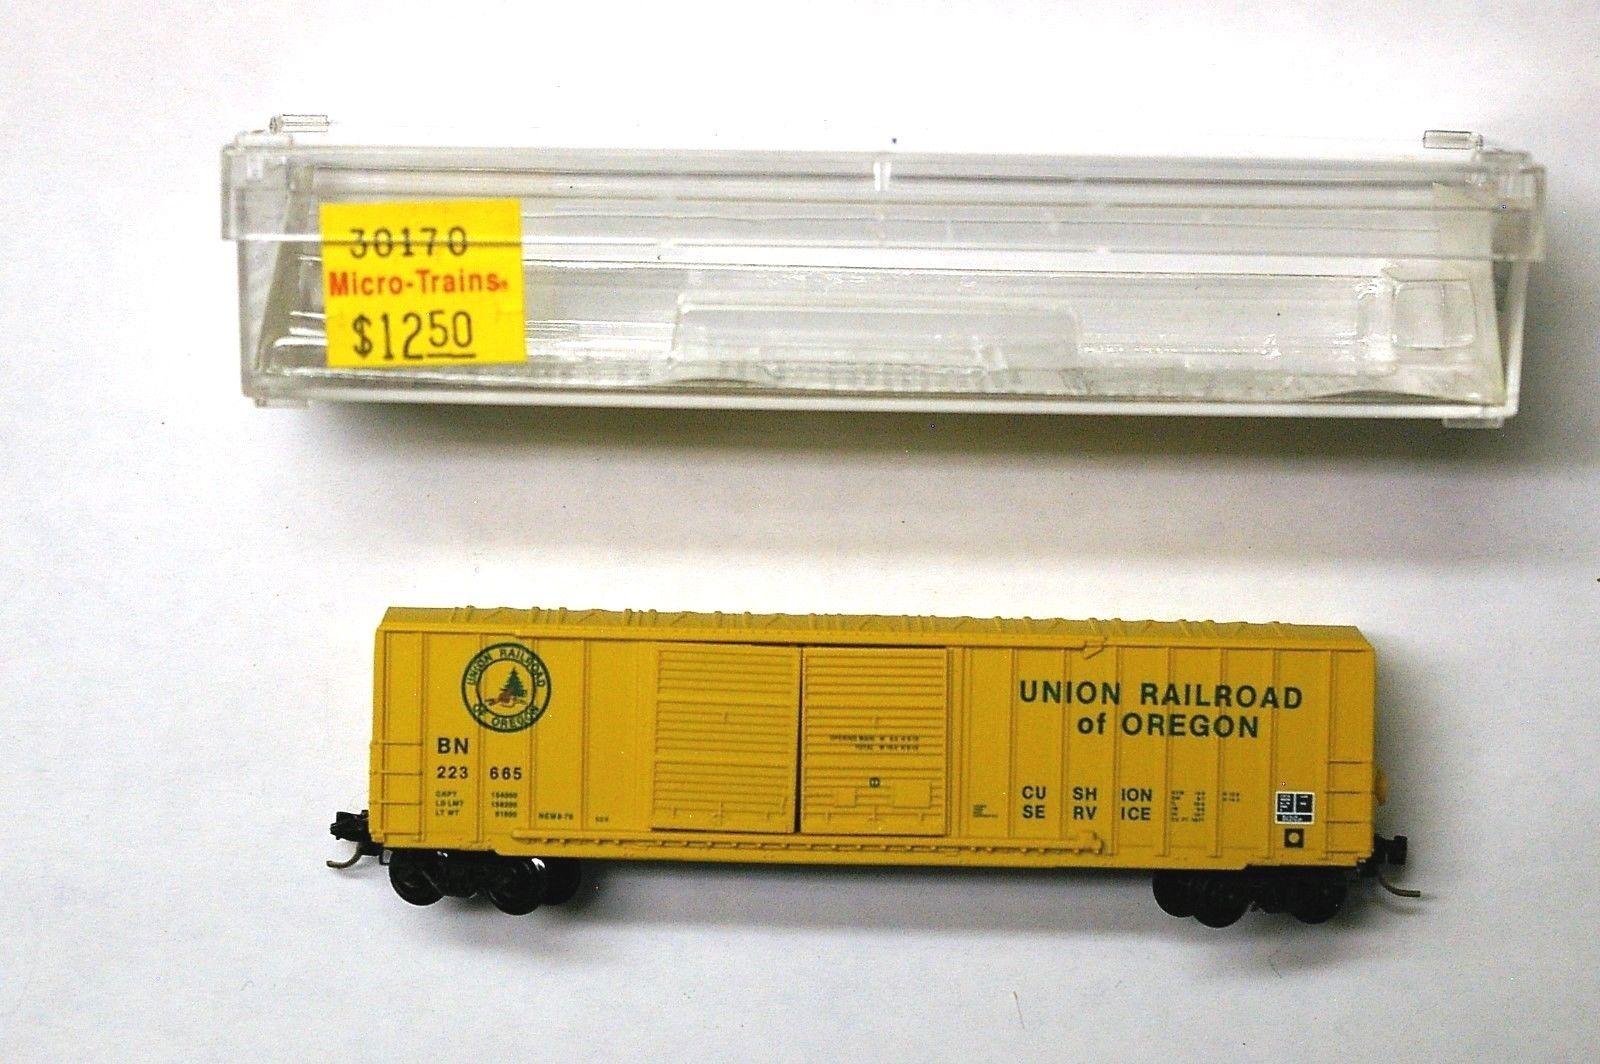 N Scale - Micro-Trains - 30170 - Boxcar, 50 Foot, Steel - Union Railroad of Oregon - 223665